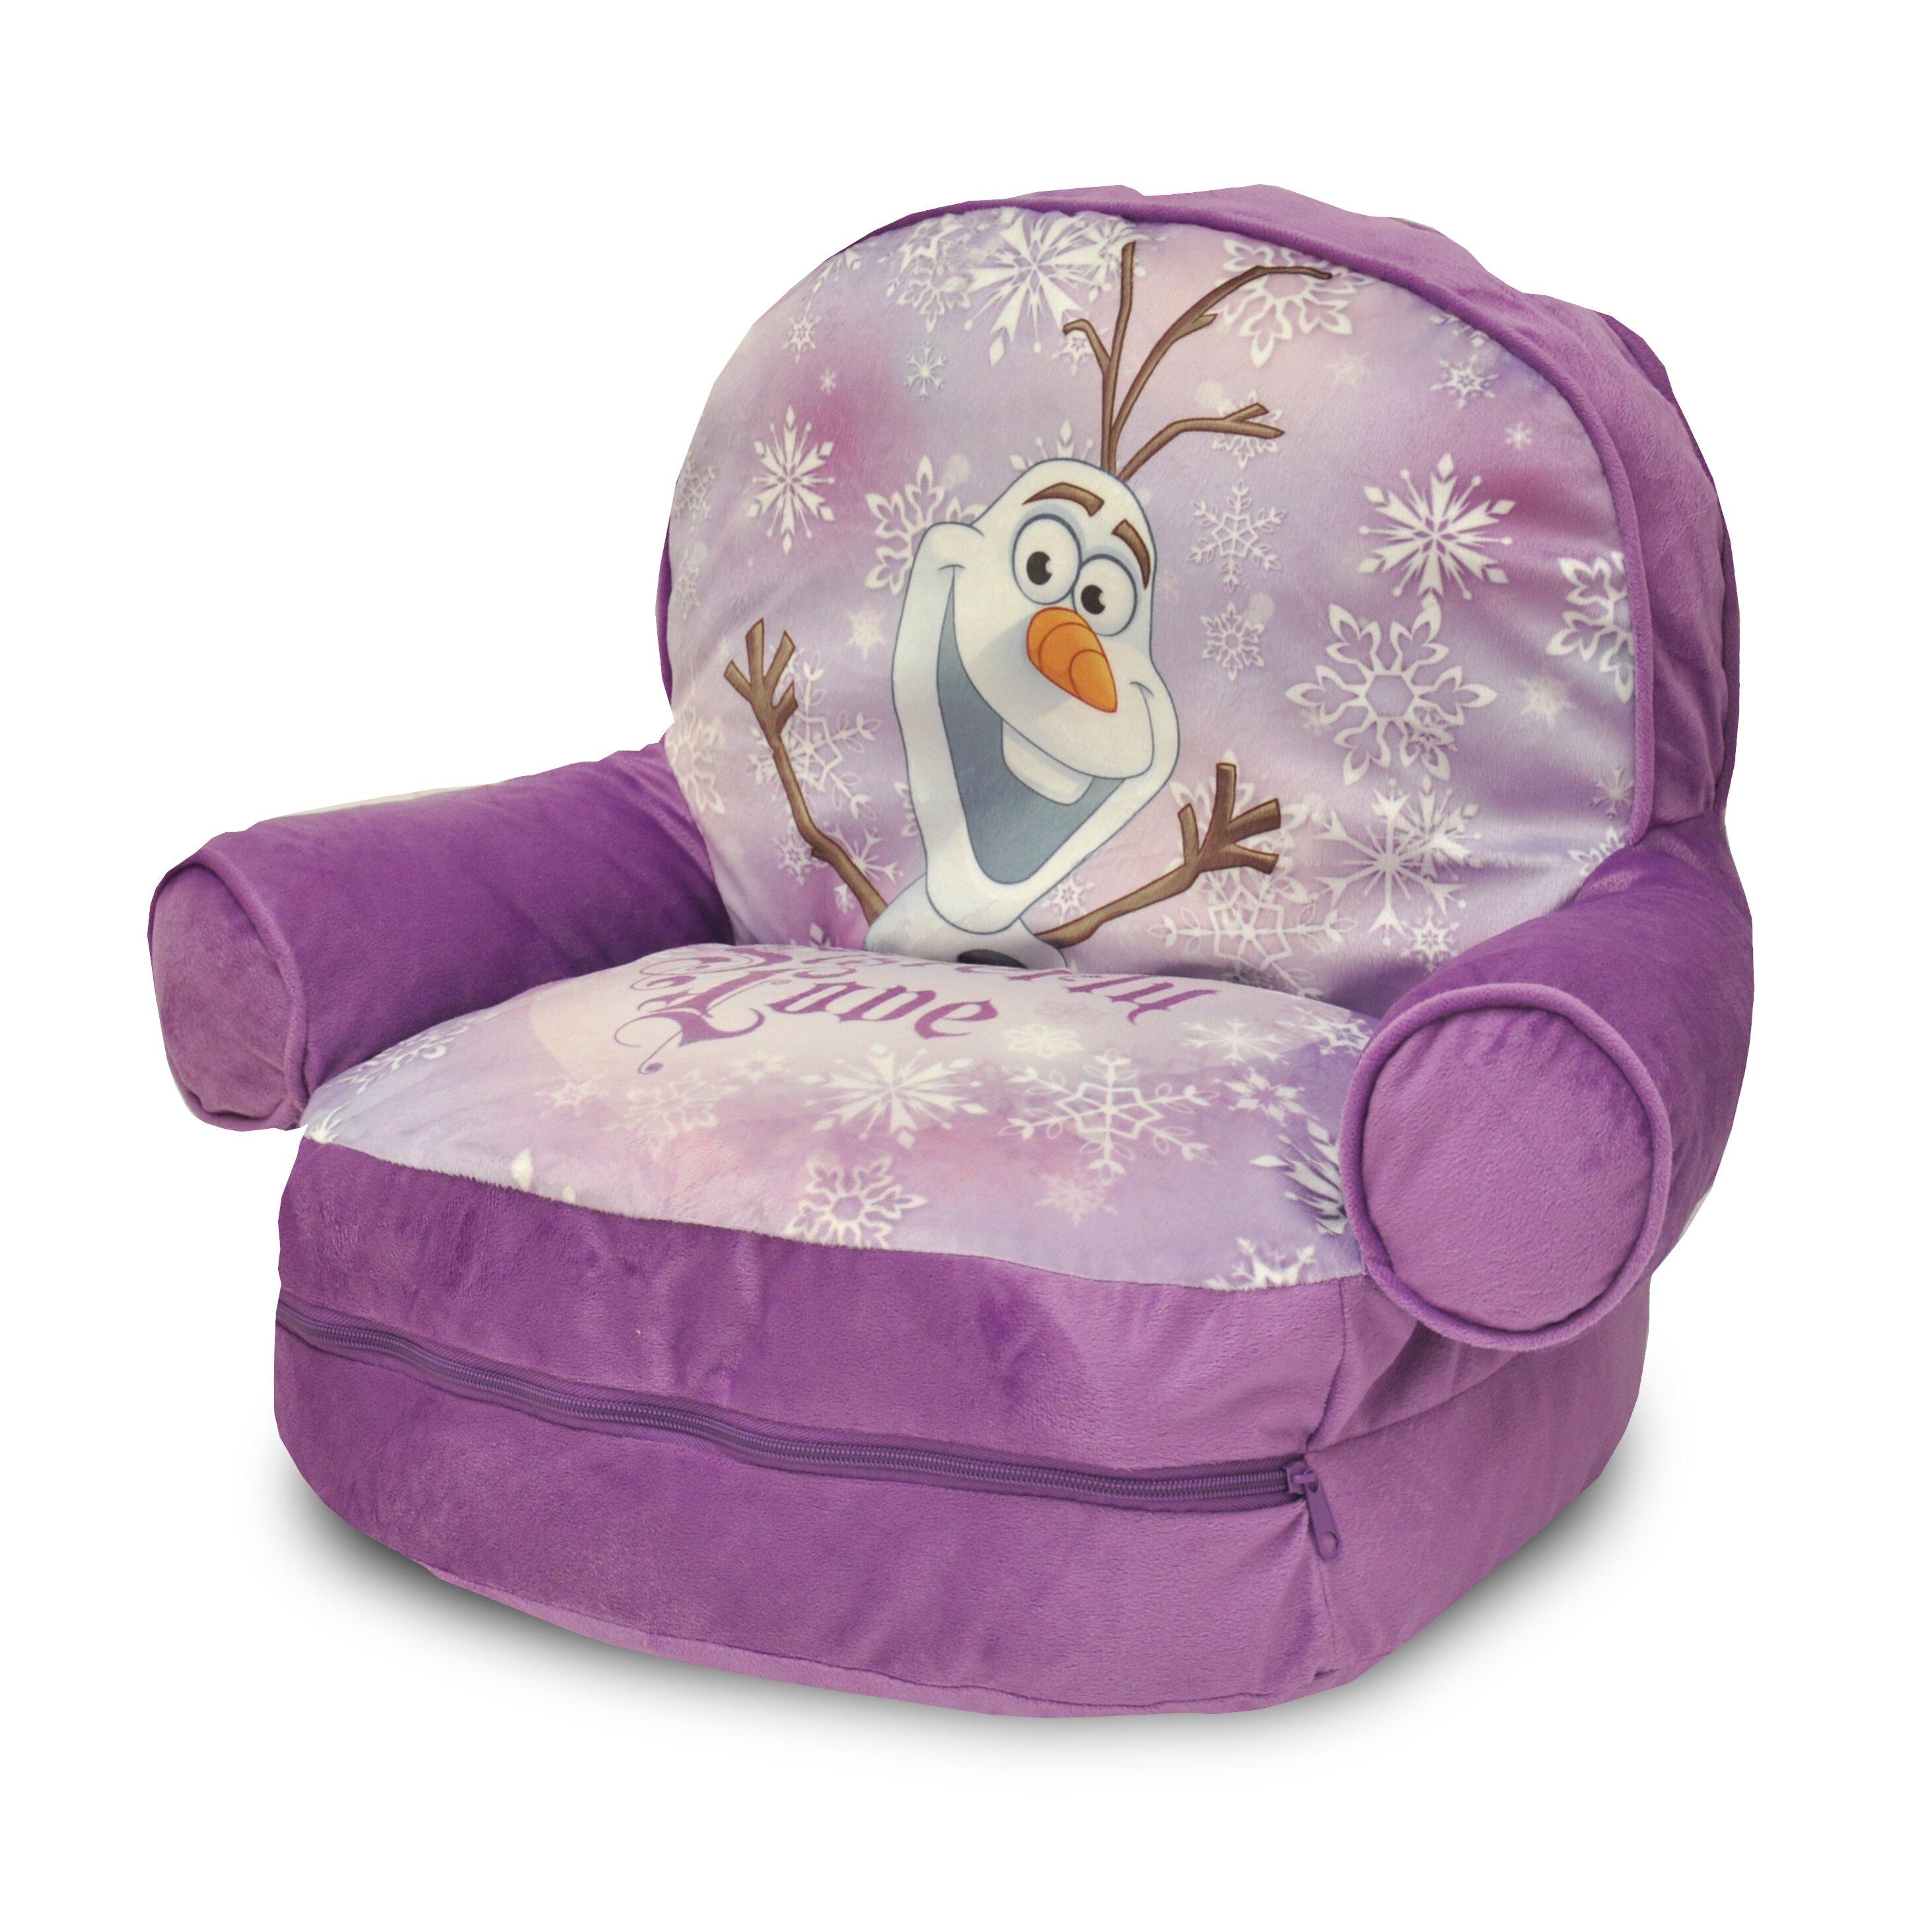 Idea Nuova Frozen Kids Novelty Chair With Storage